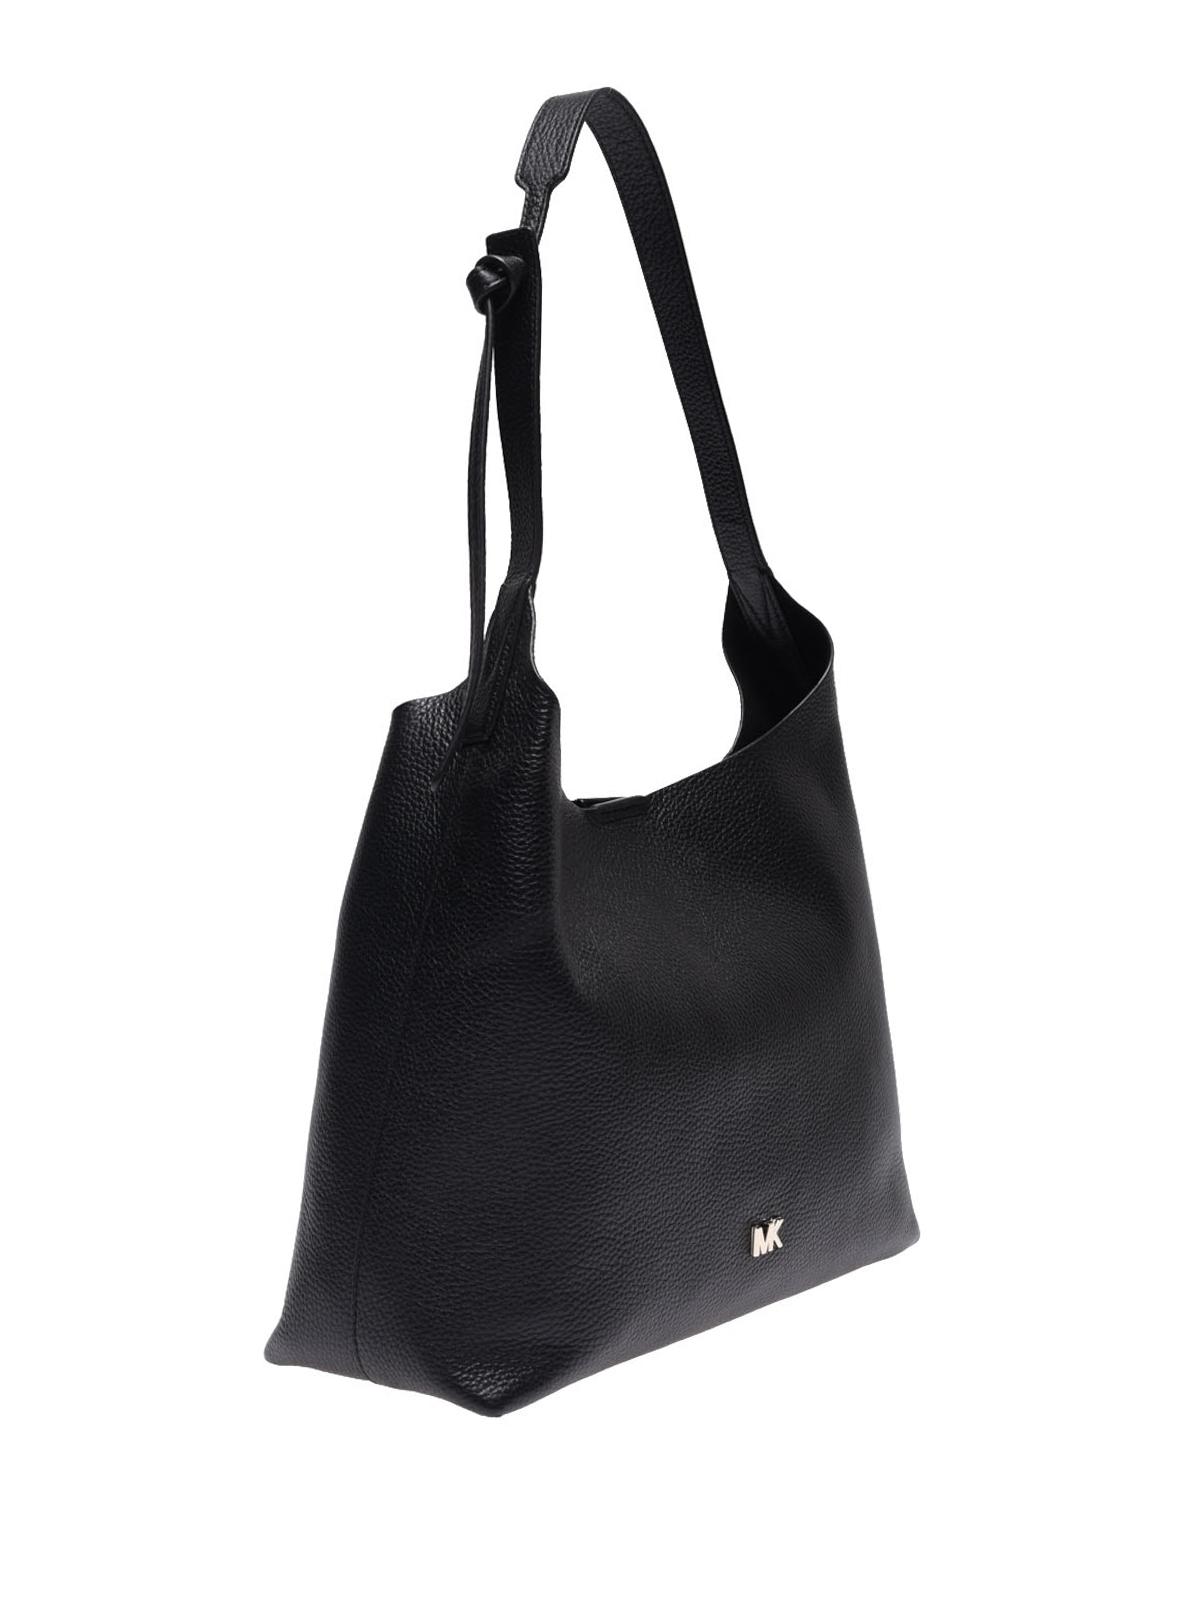 2ac8edb113f8 Michael Kors - Junie medium hobo bag - shoulder bags - 30T8TX5H2L 001